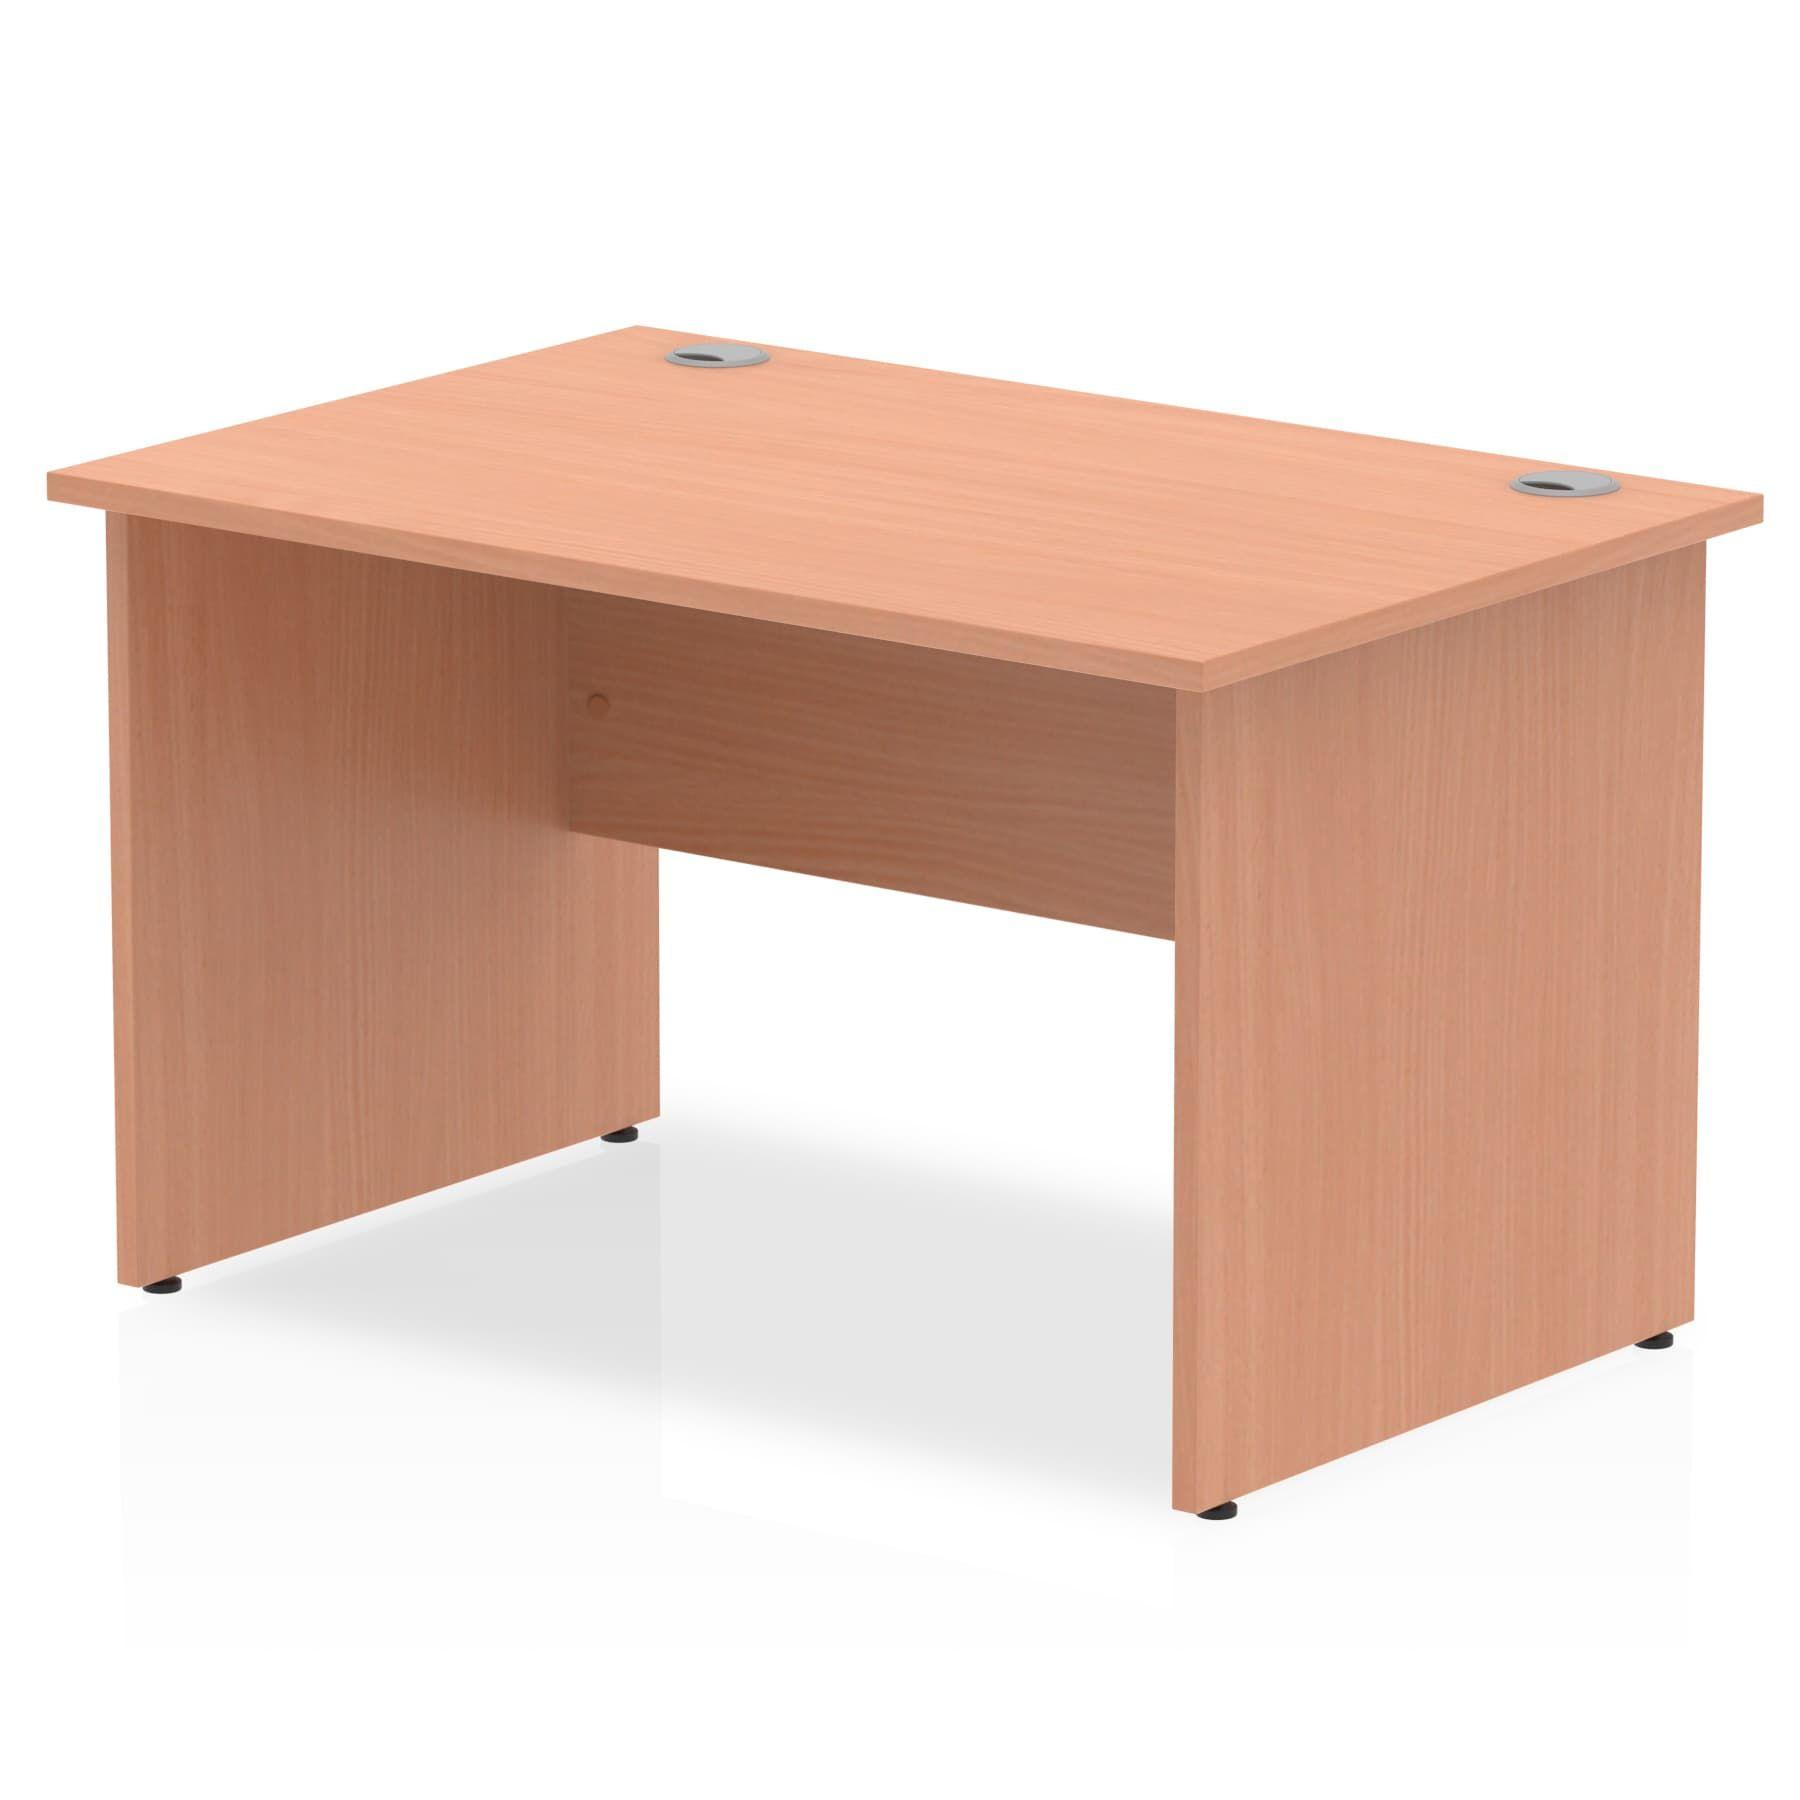 Impulse Panel End 1200 Rectangle Desk